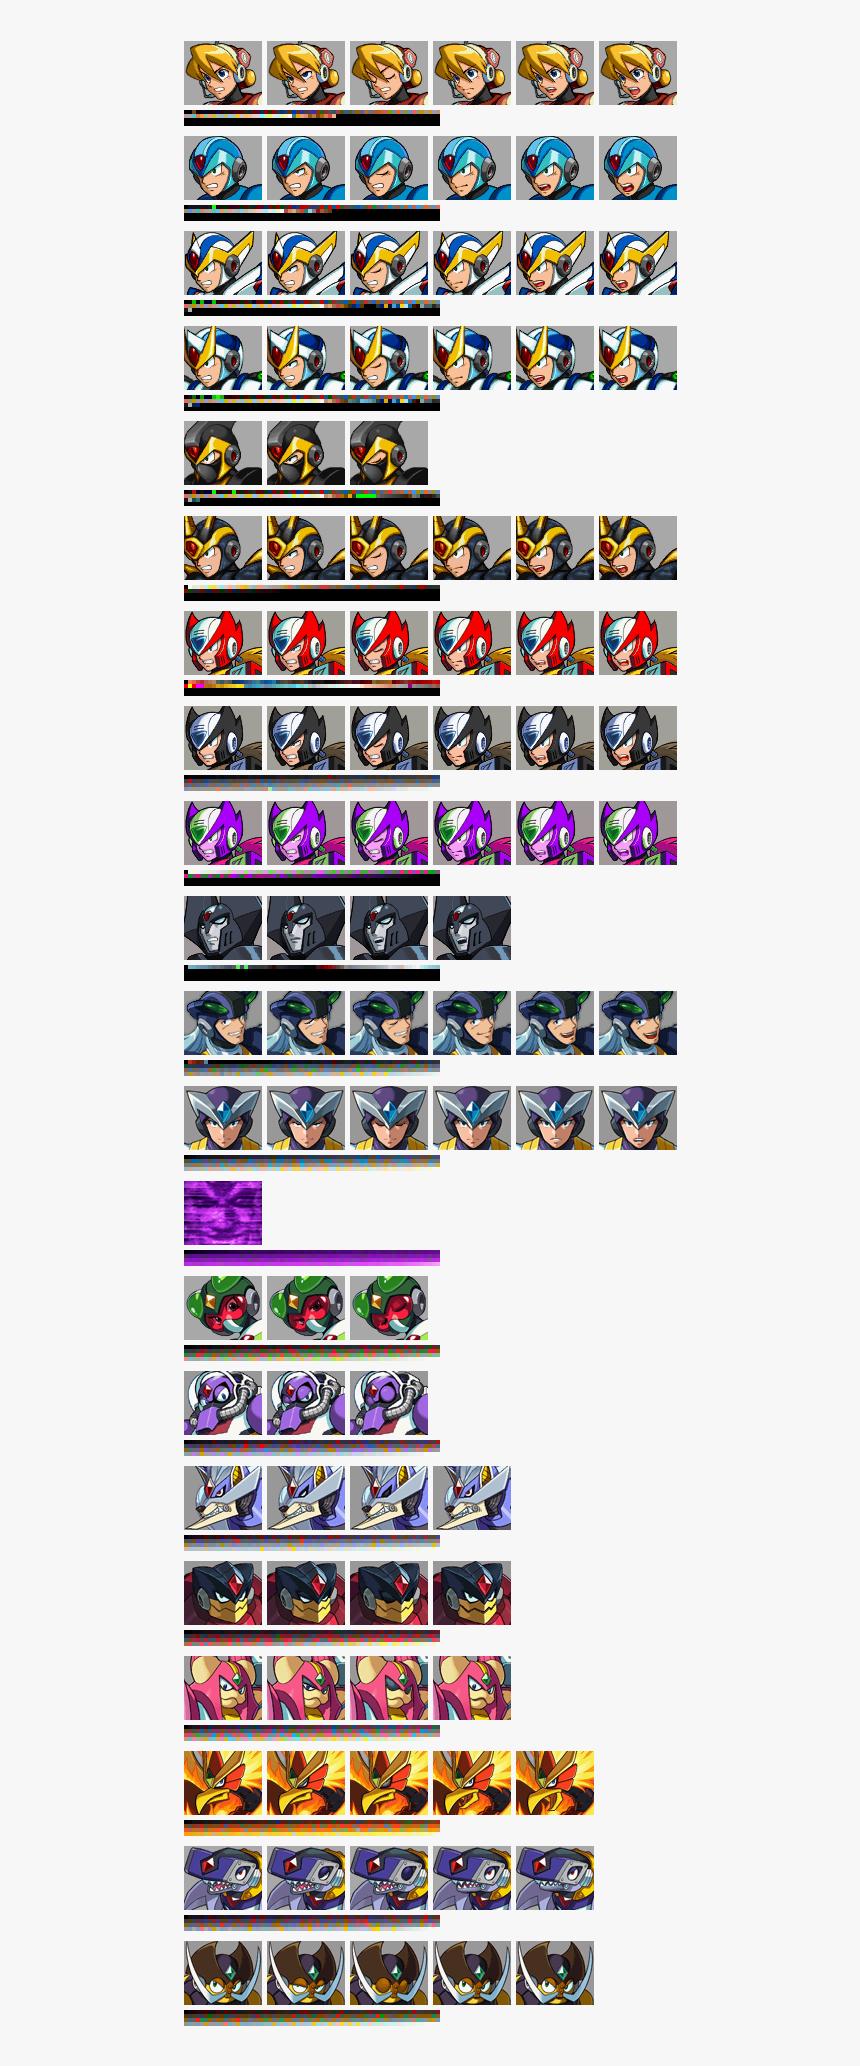 Megaman X6 Zero Mugshot Hd Png Download Transparent Png Image Pngitem